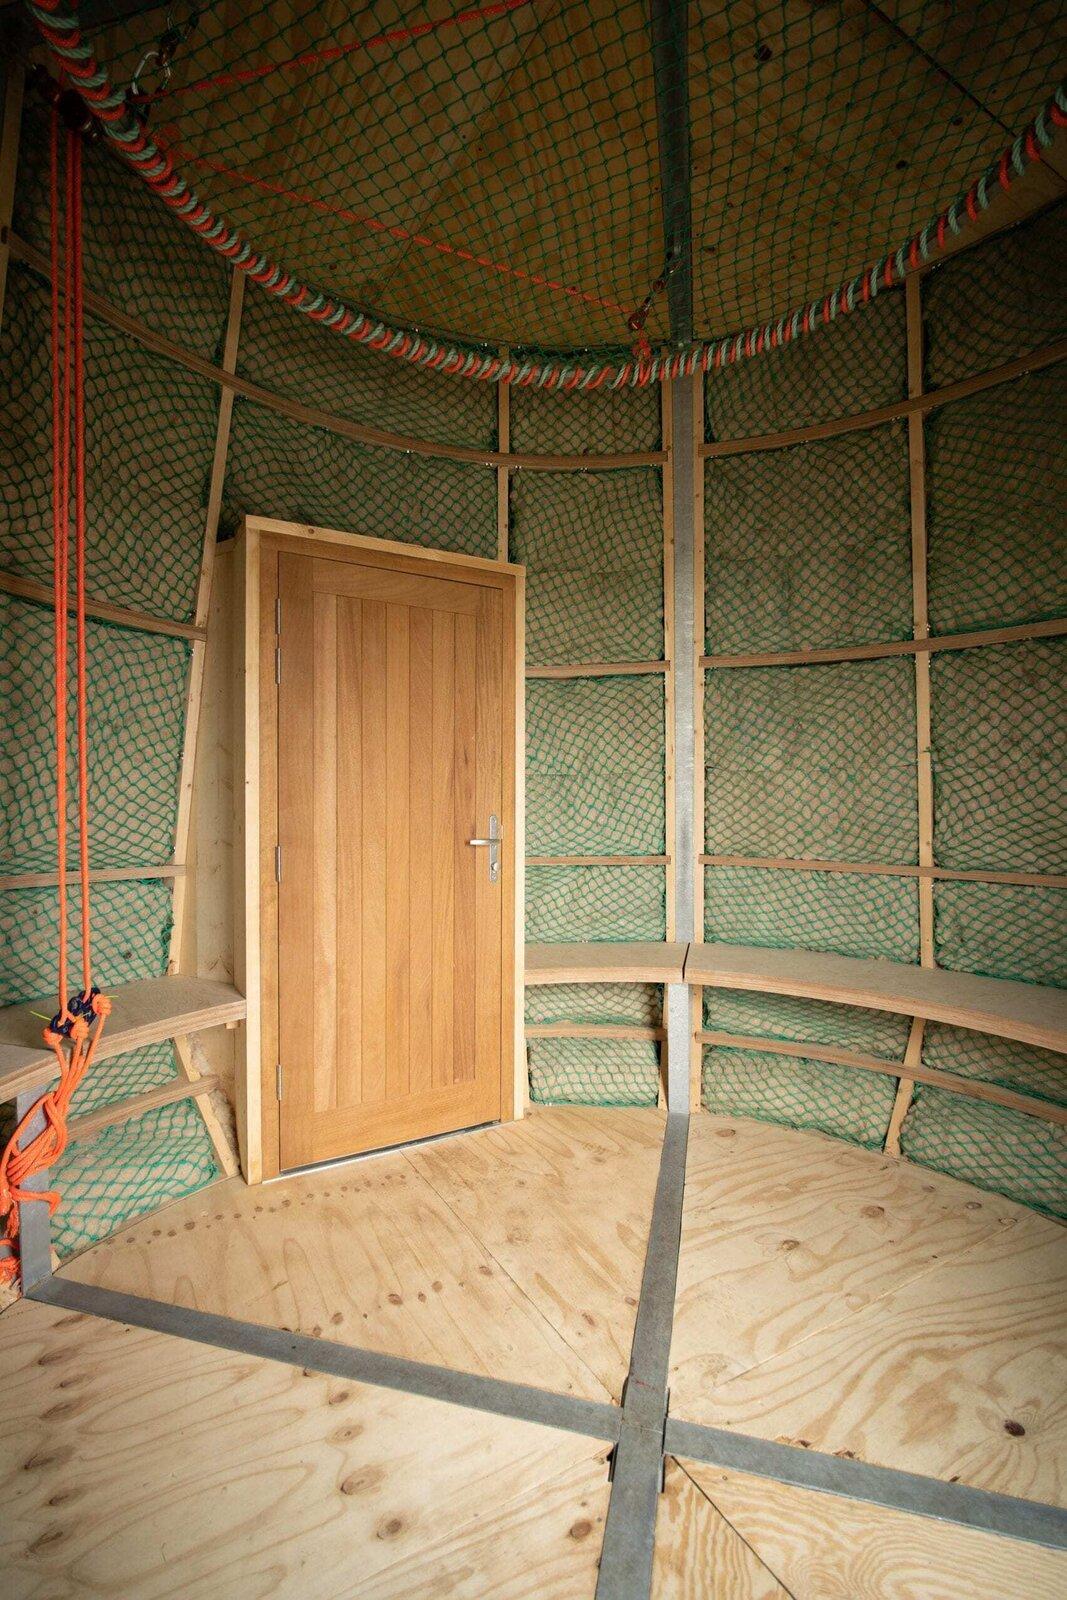 Studio Drop interior